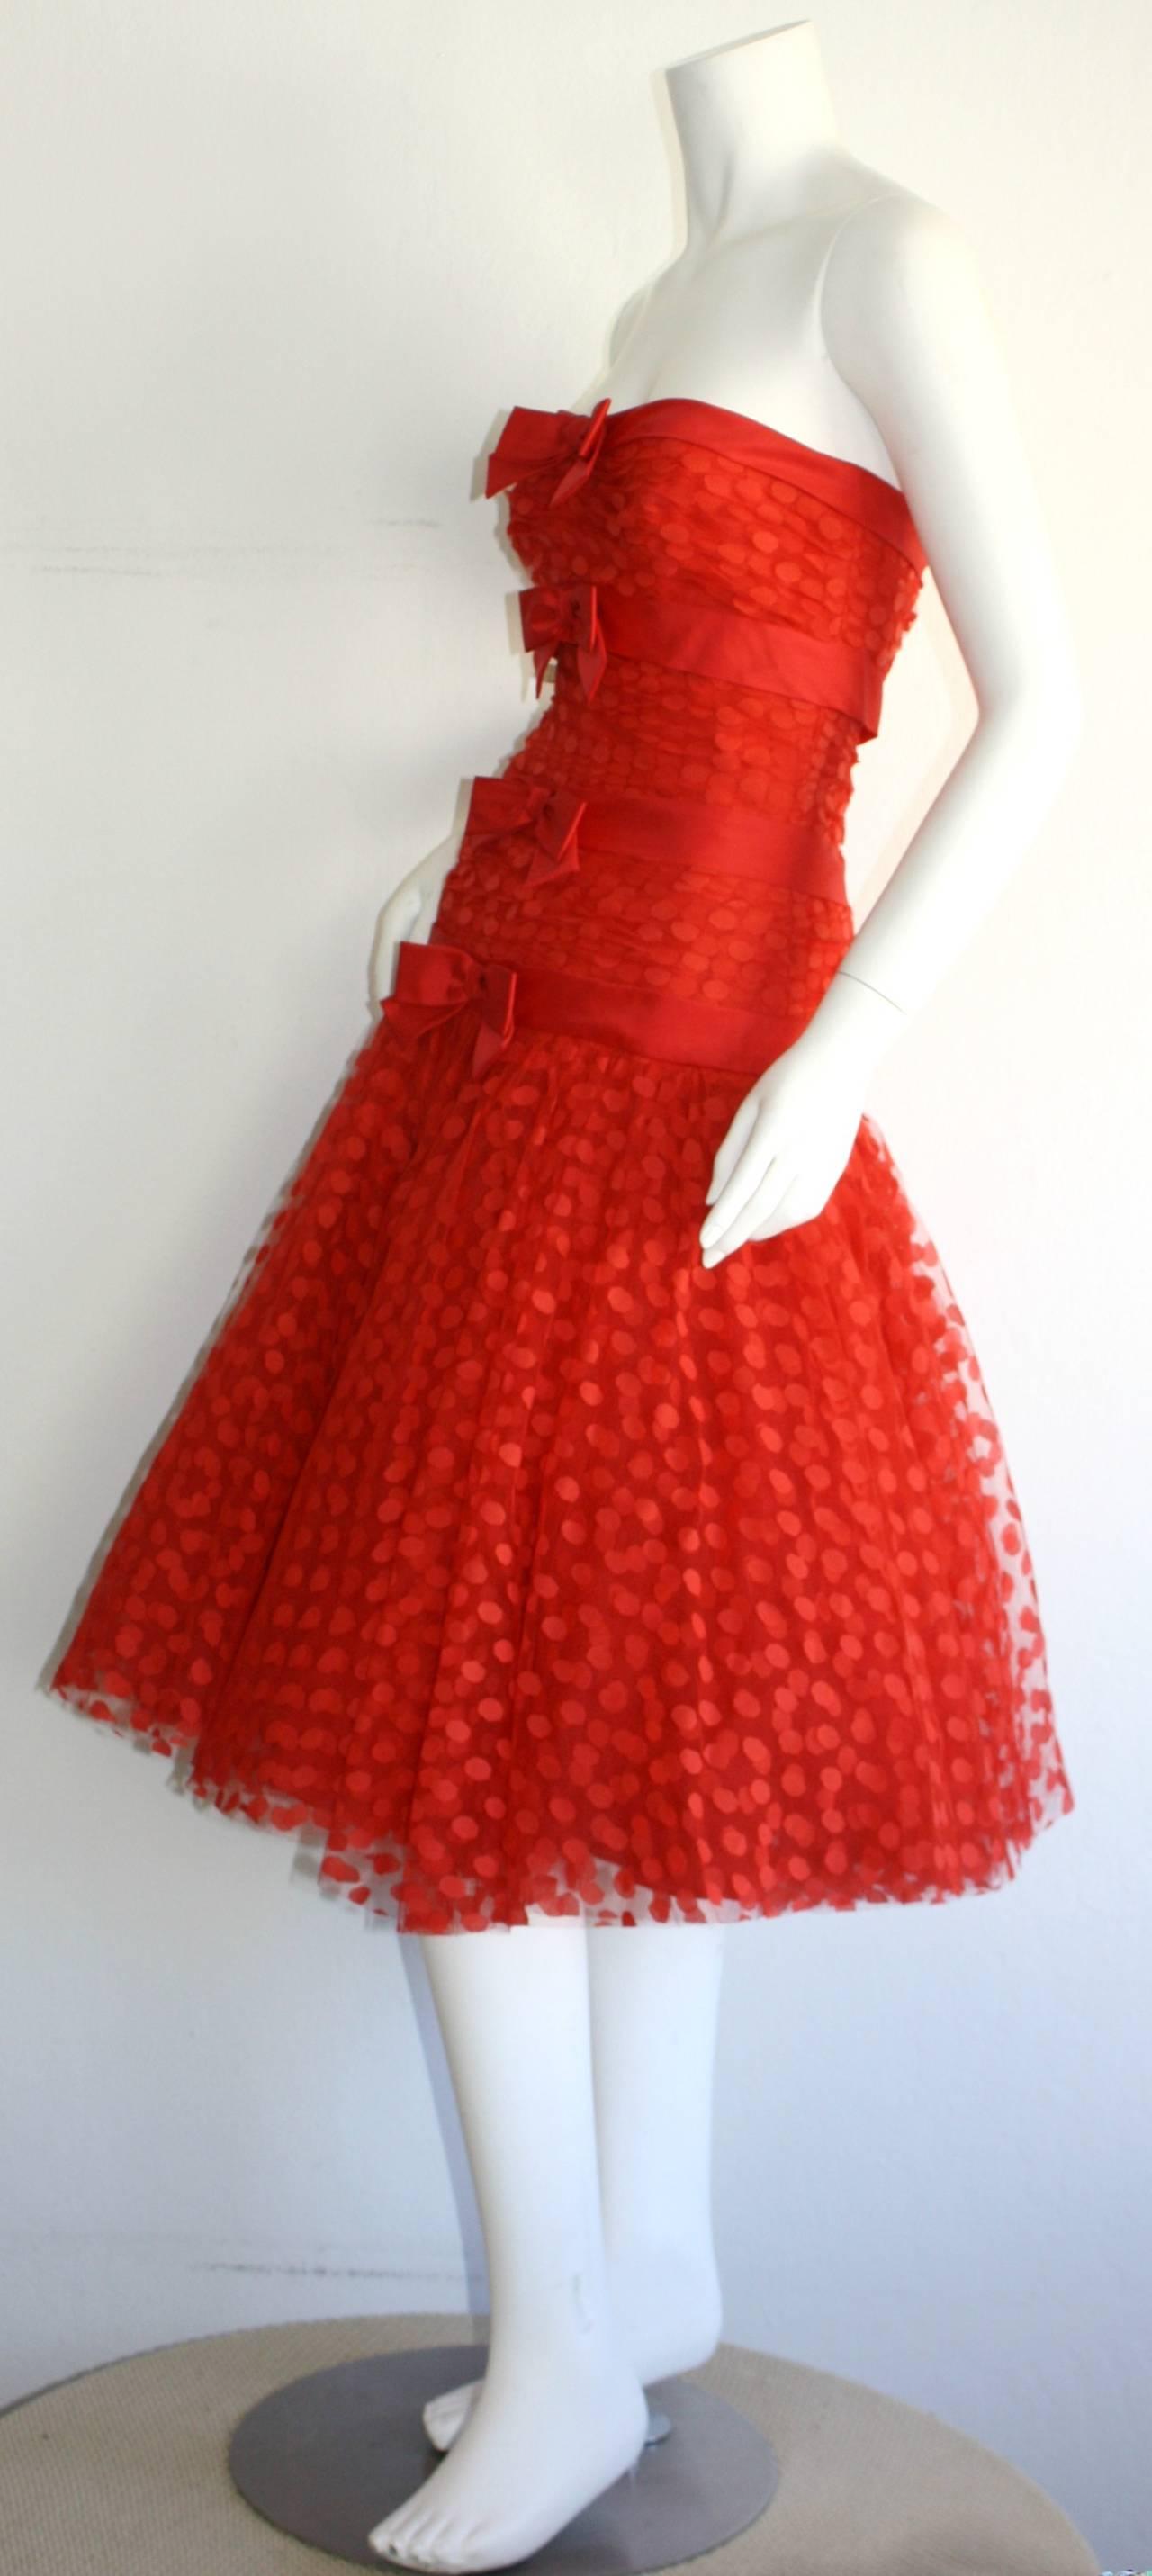 Incredible Vintage Jill Richards for Elizabeth Arden Red Valentine's Day Dress 6